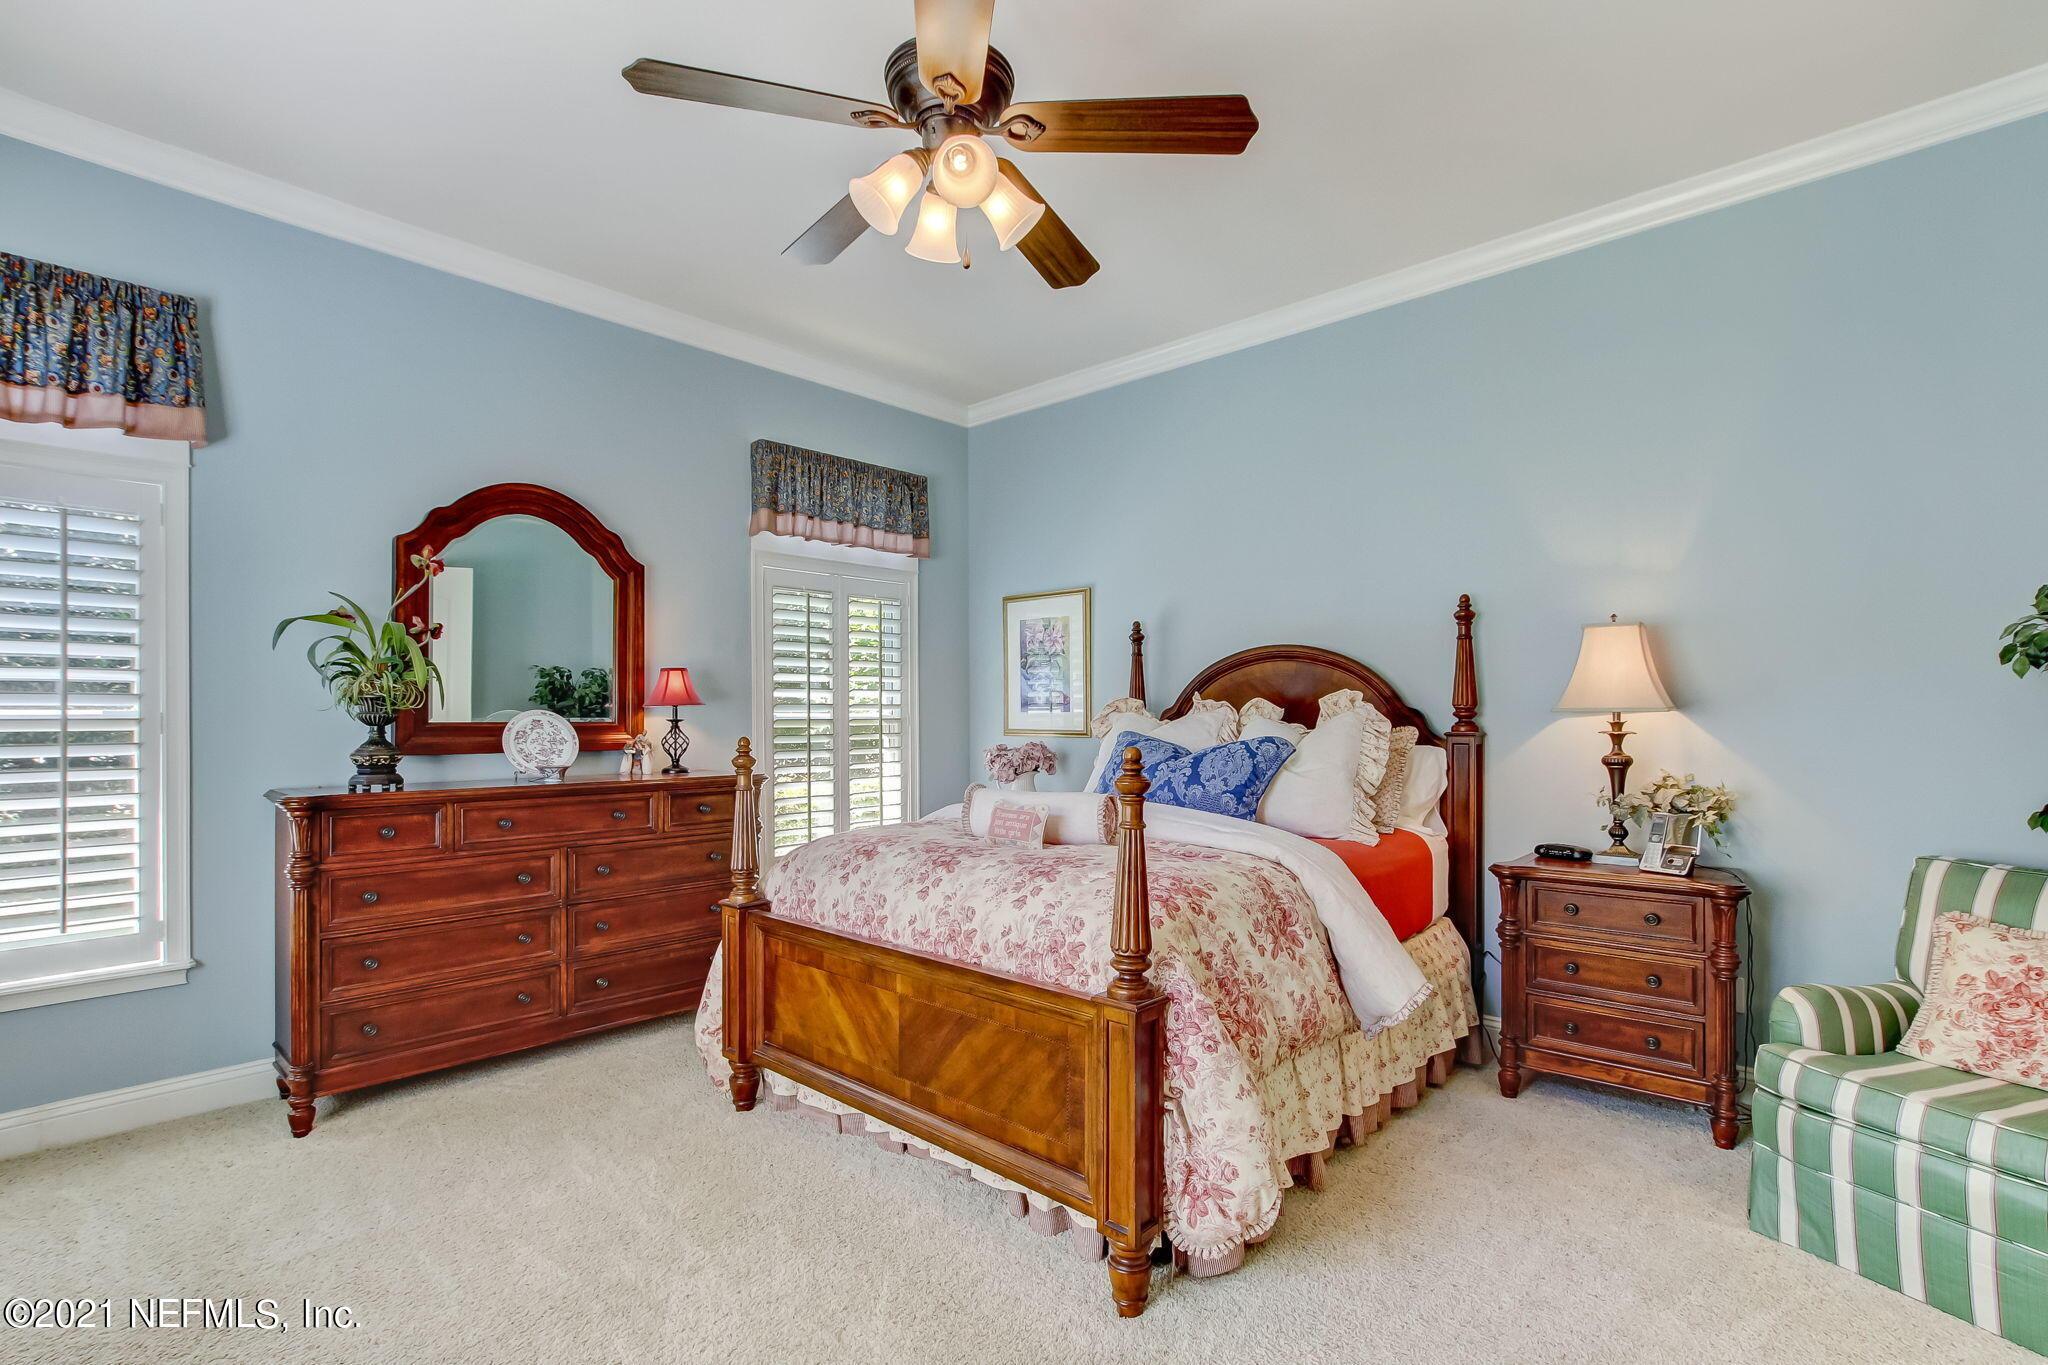 4640 TUSCAN WOOD, ST AUGUSTINE, FLORIDA 32092, 4 Bedrooms Bedrooms, ,3 BathroomsBathrooms,Residential,For sale,TUSCAN WOOD,1106246